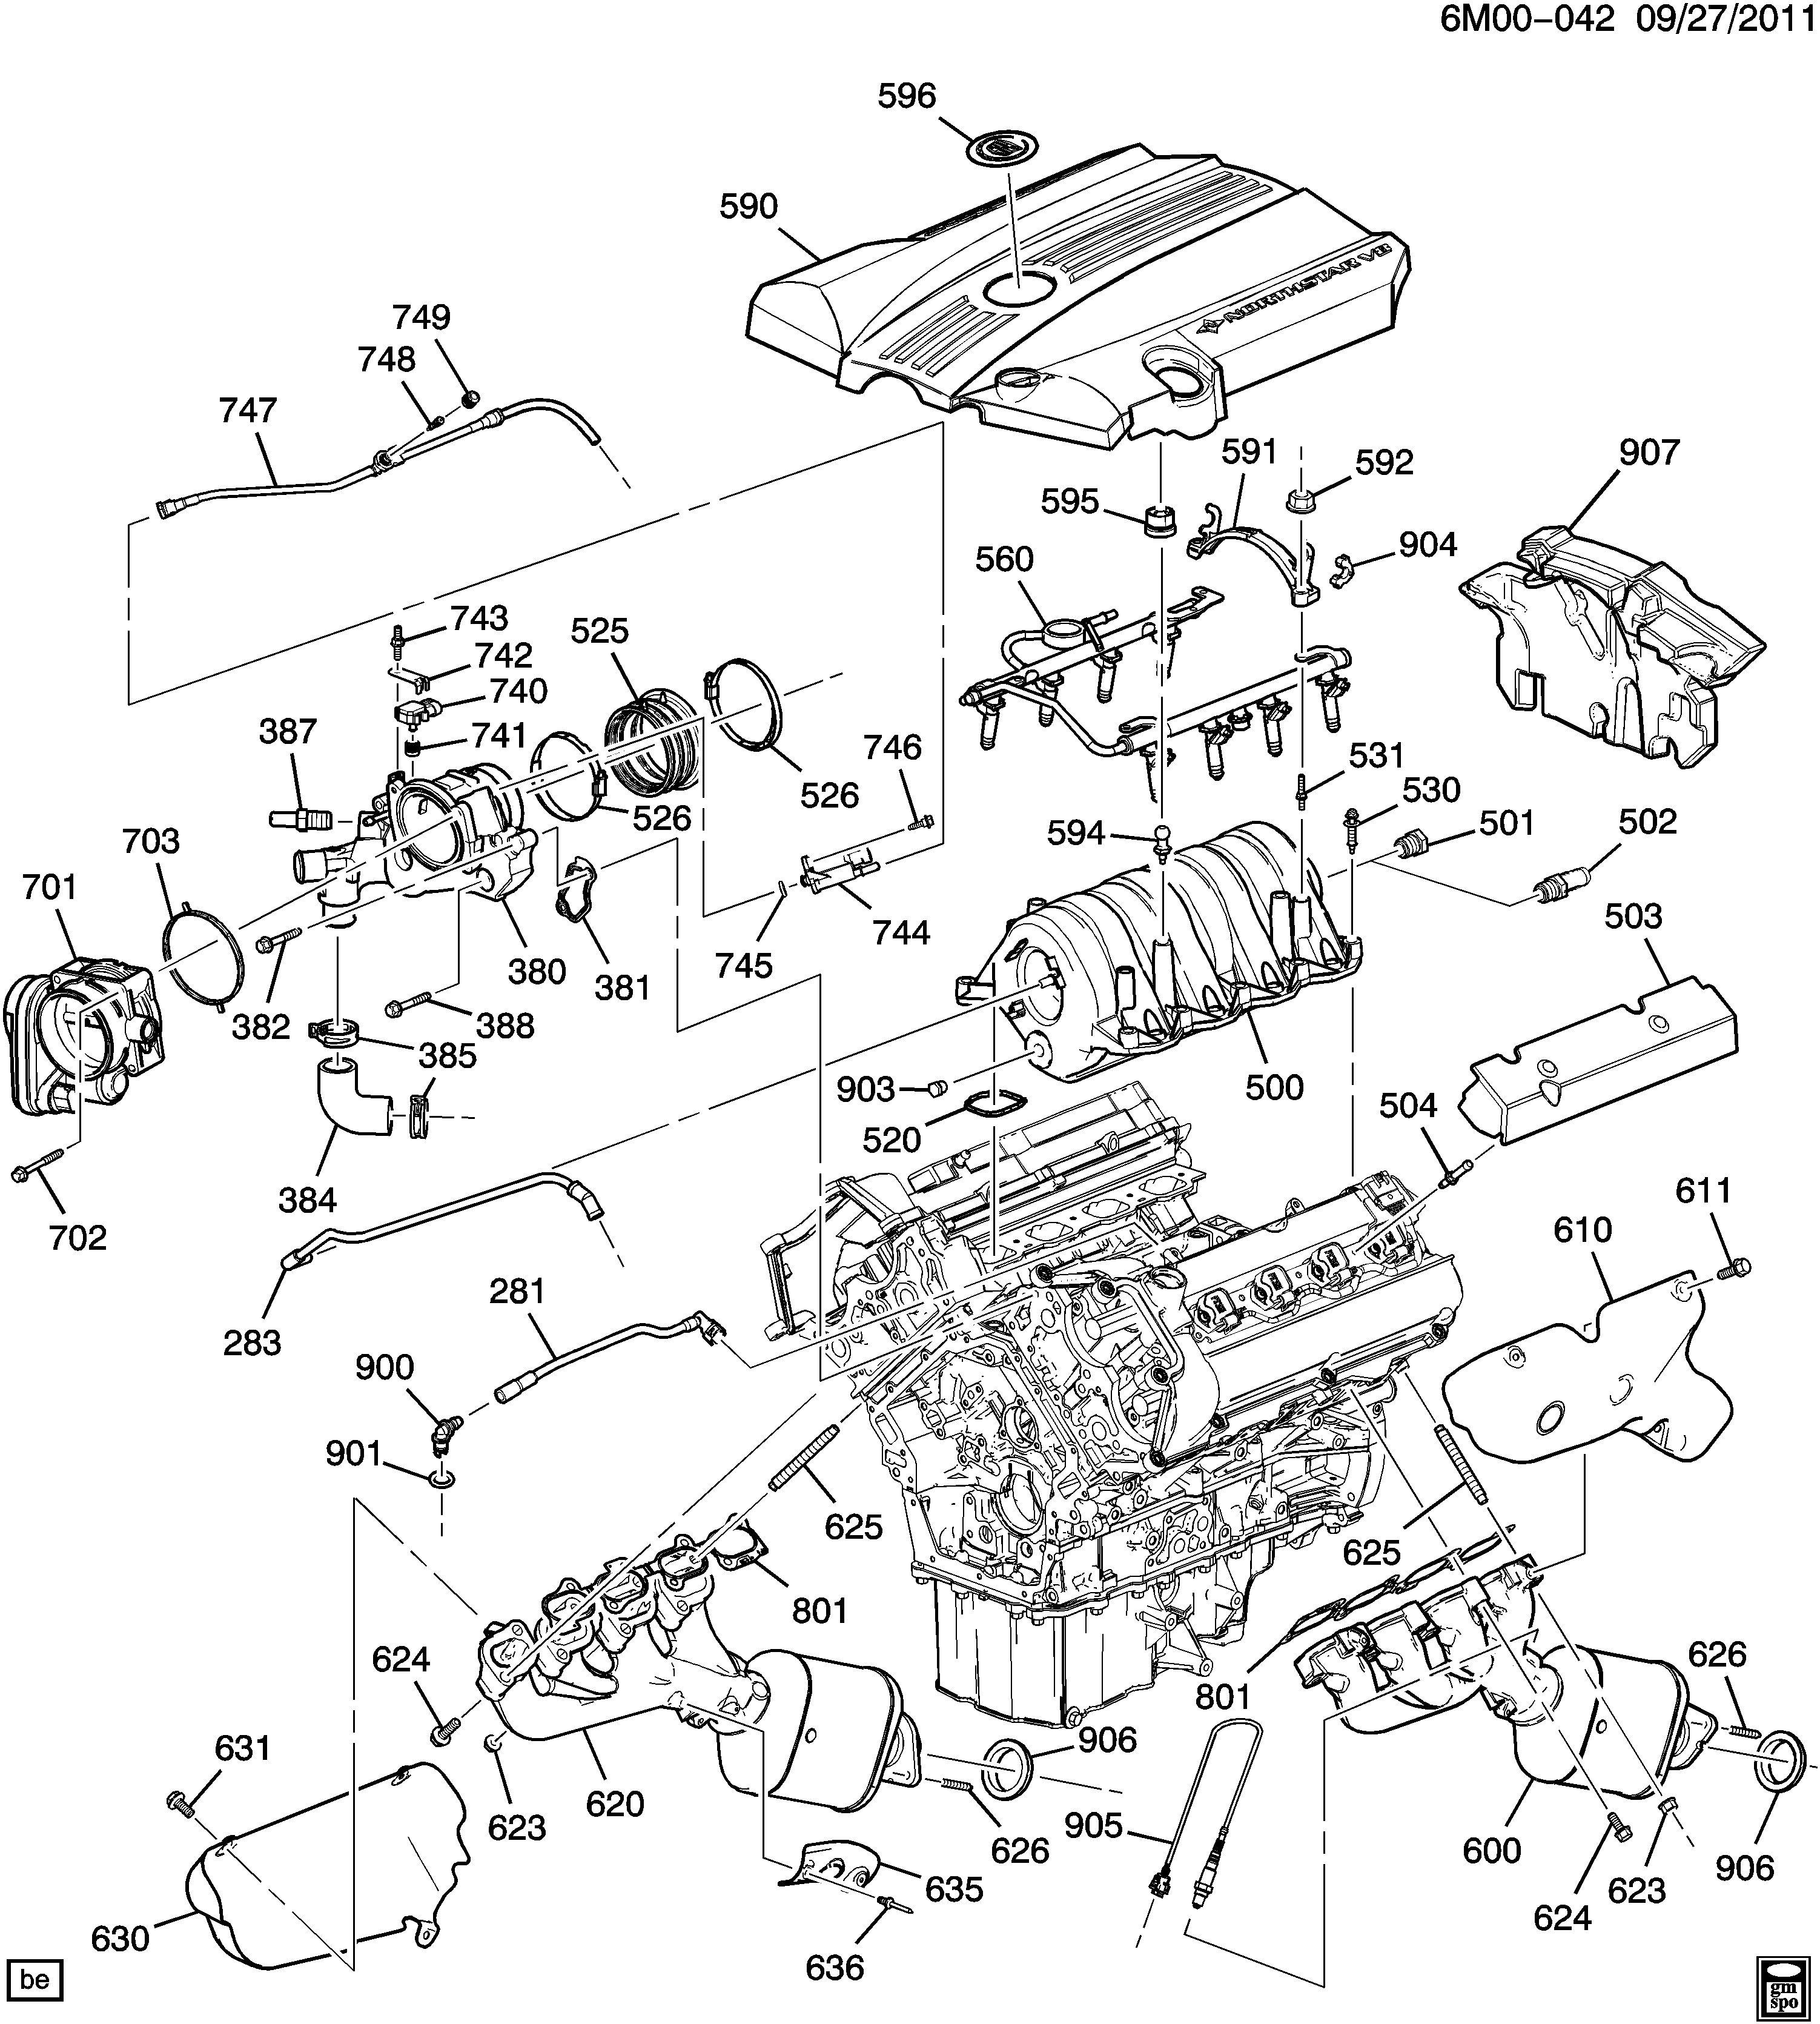 Wiring Diagrams For 2000 Cadillac Sls Wiring Diagrams Site Slim Star Slim Star Geasparquet It